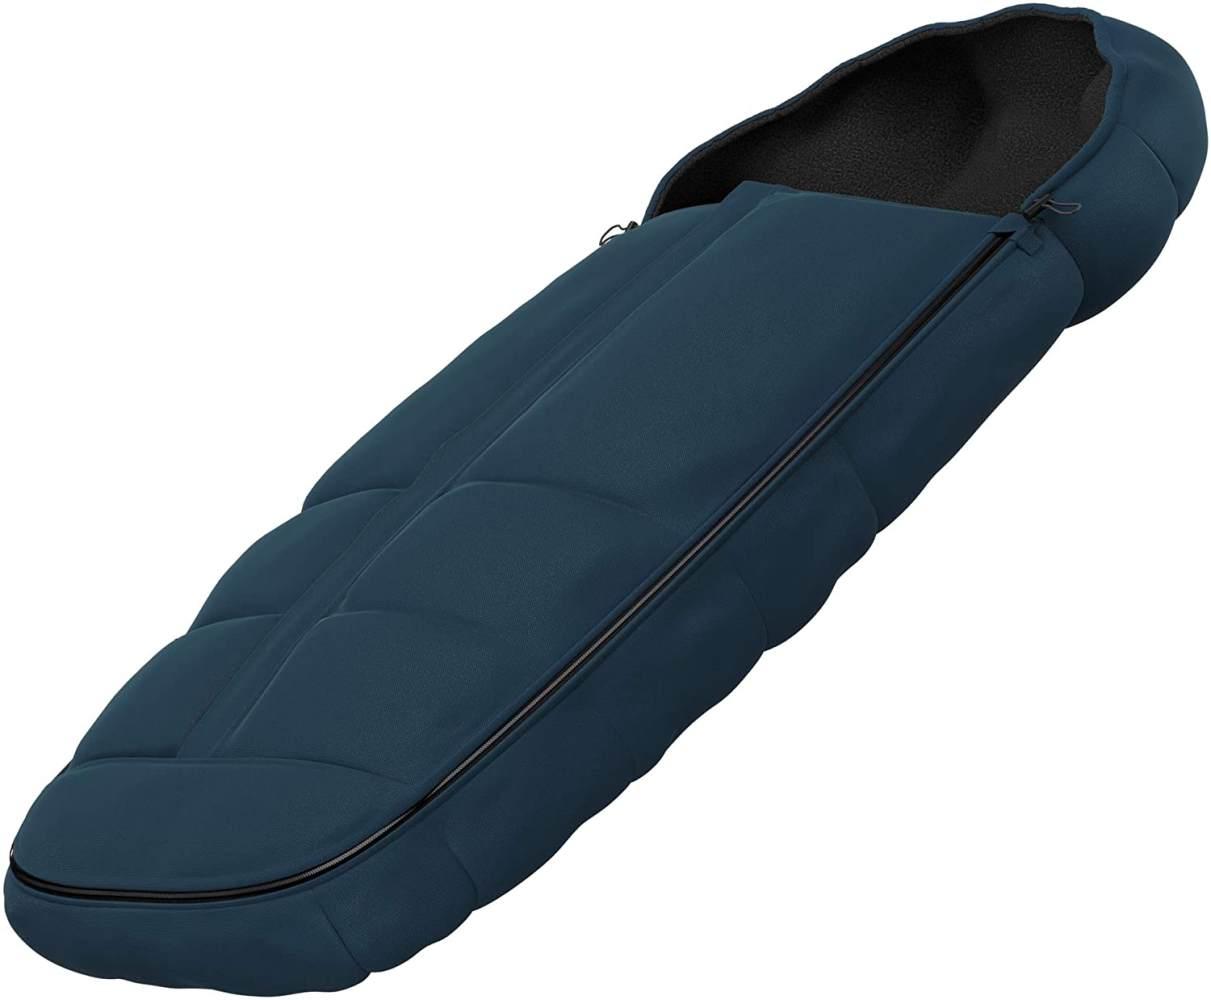 Thule Sleek Premium-Fußsack Navy blue, universell einsetzbar Bild 1